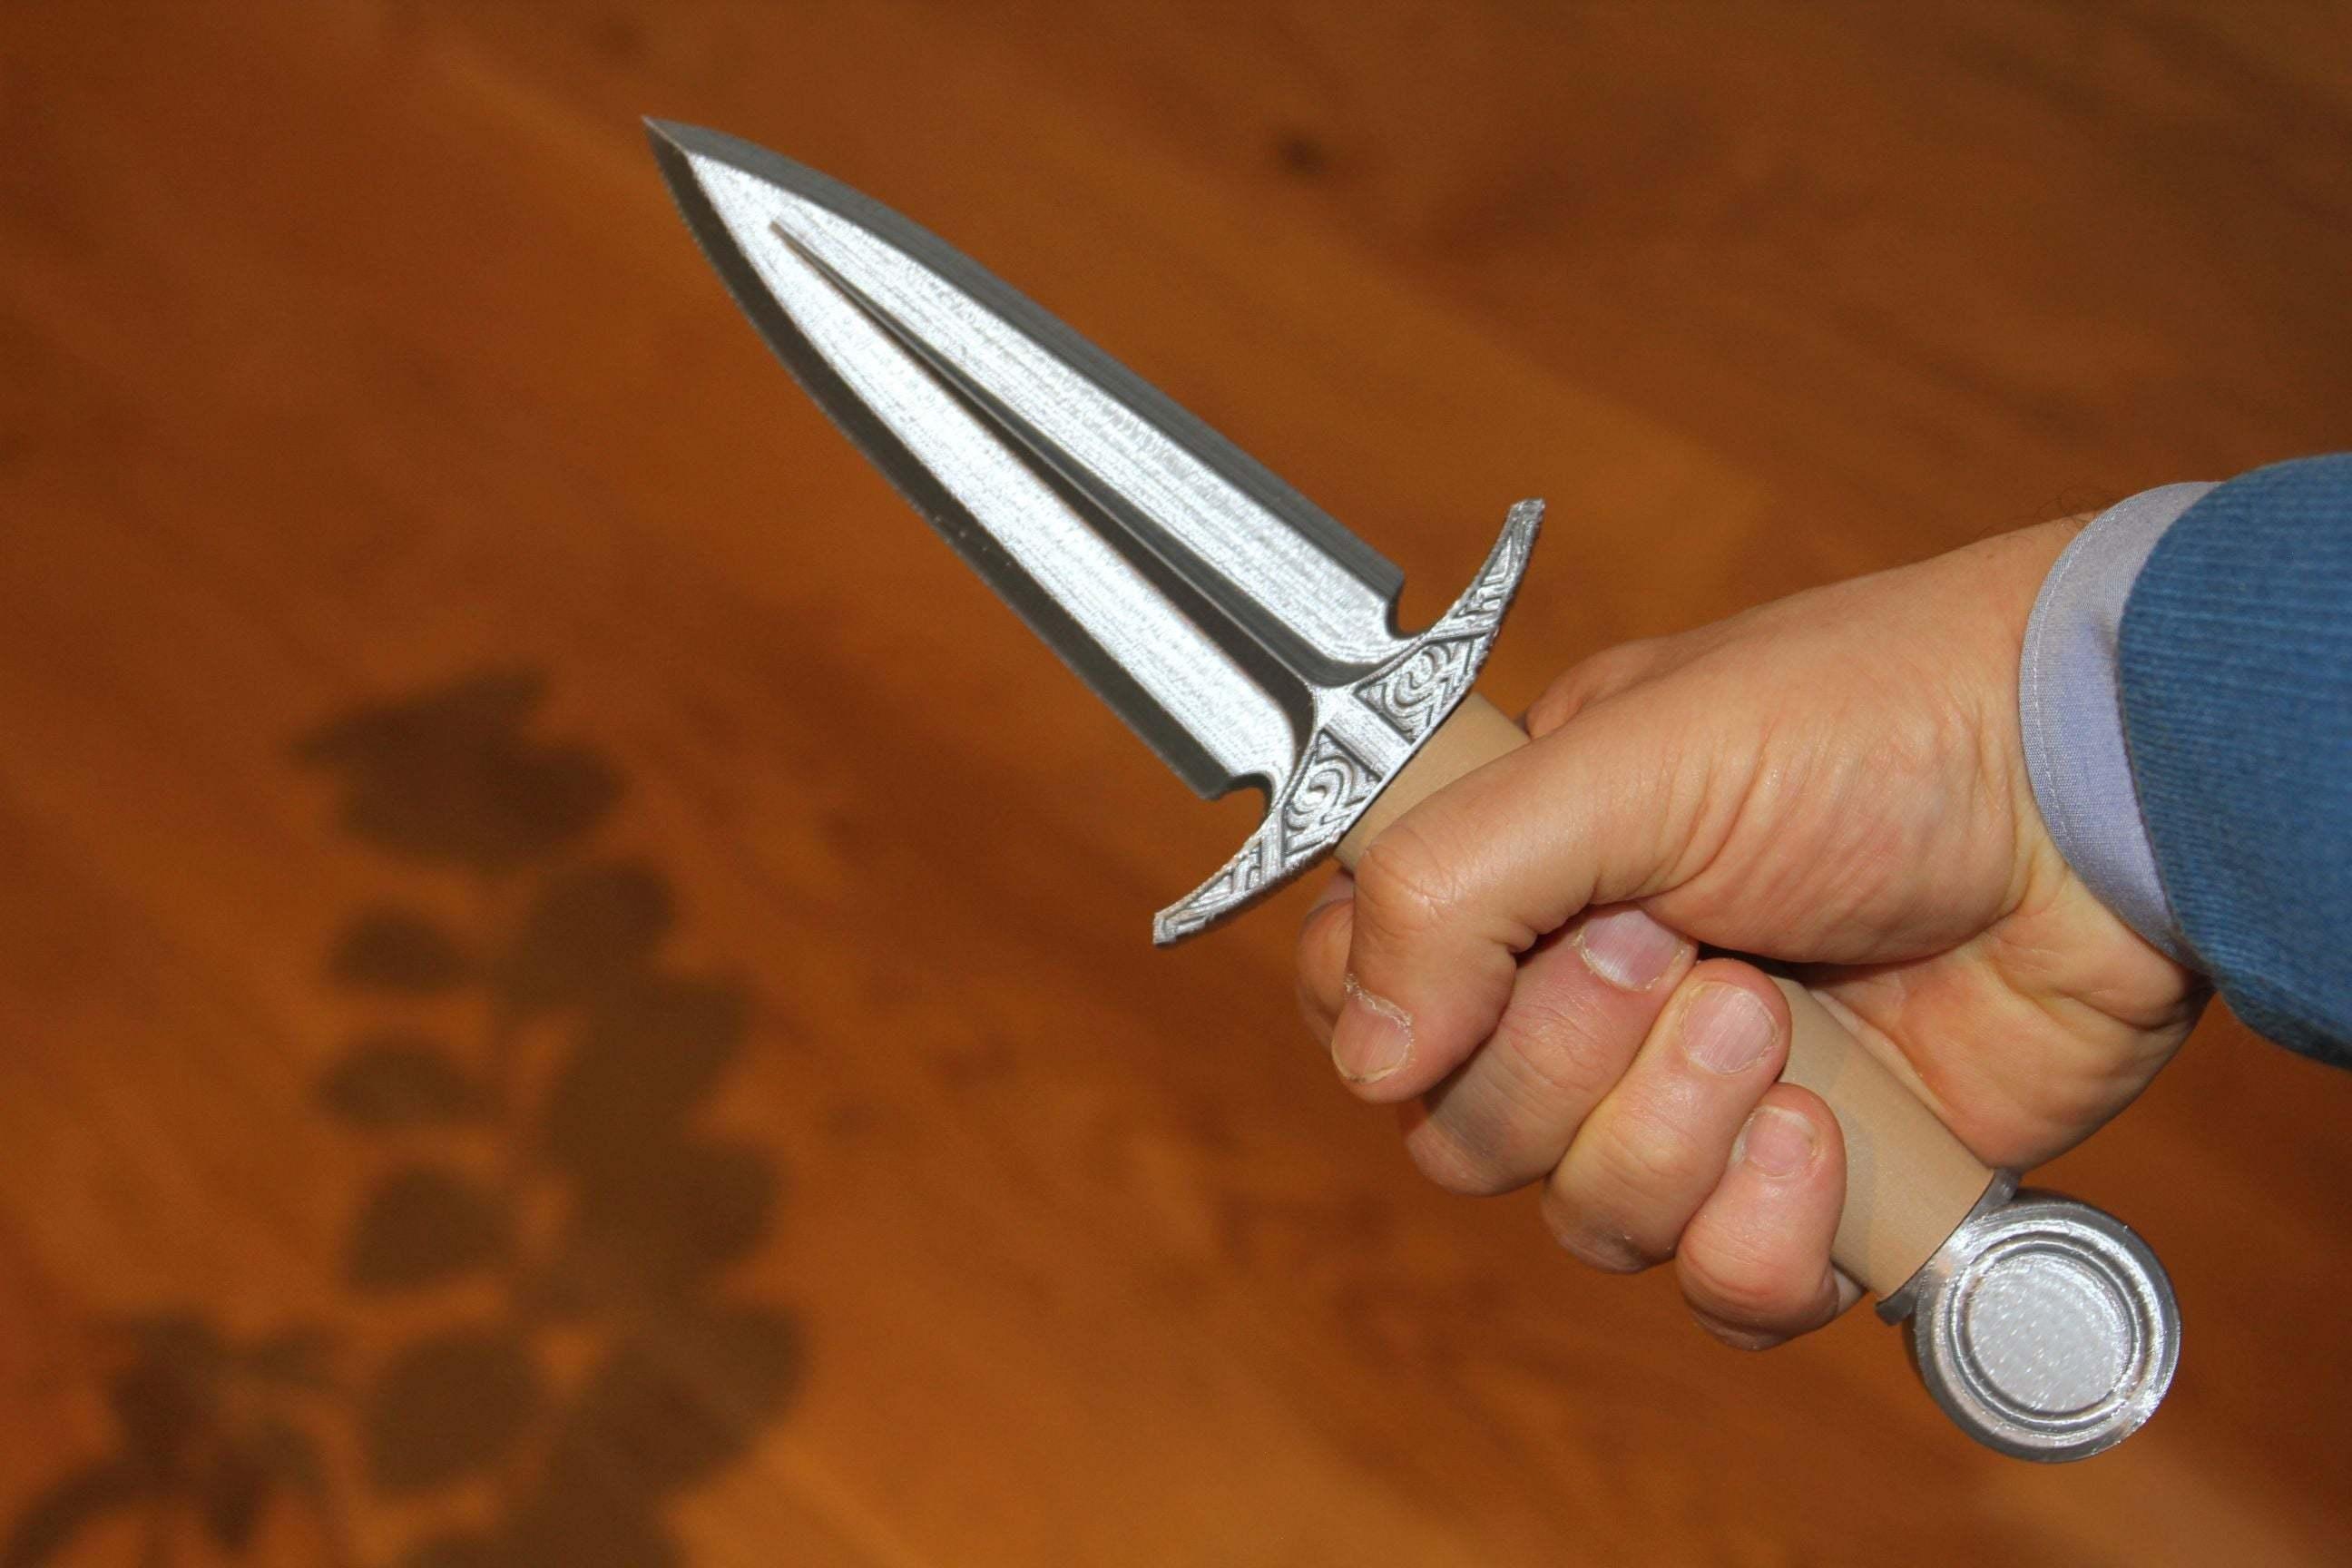 dagger6.jpg Download free STL file Dagger - easy to print, no support • 3D printable model, plokr